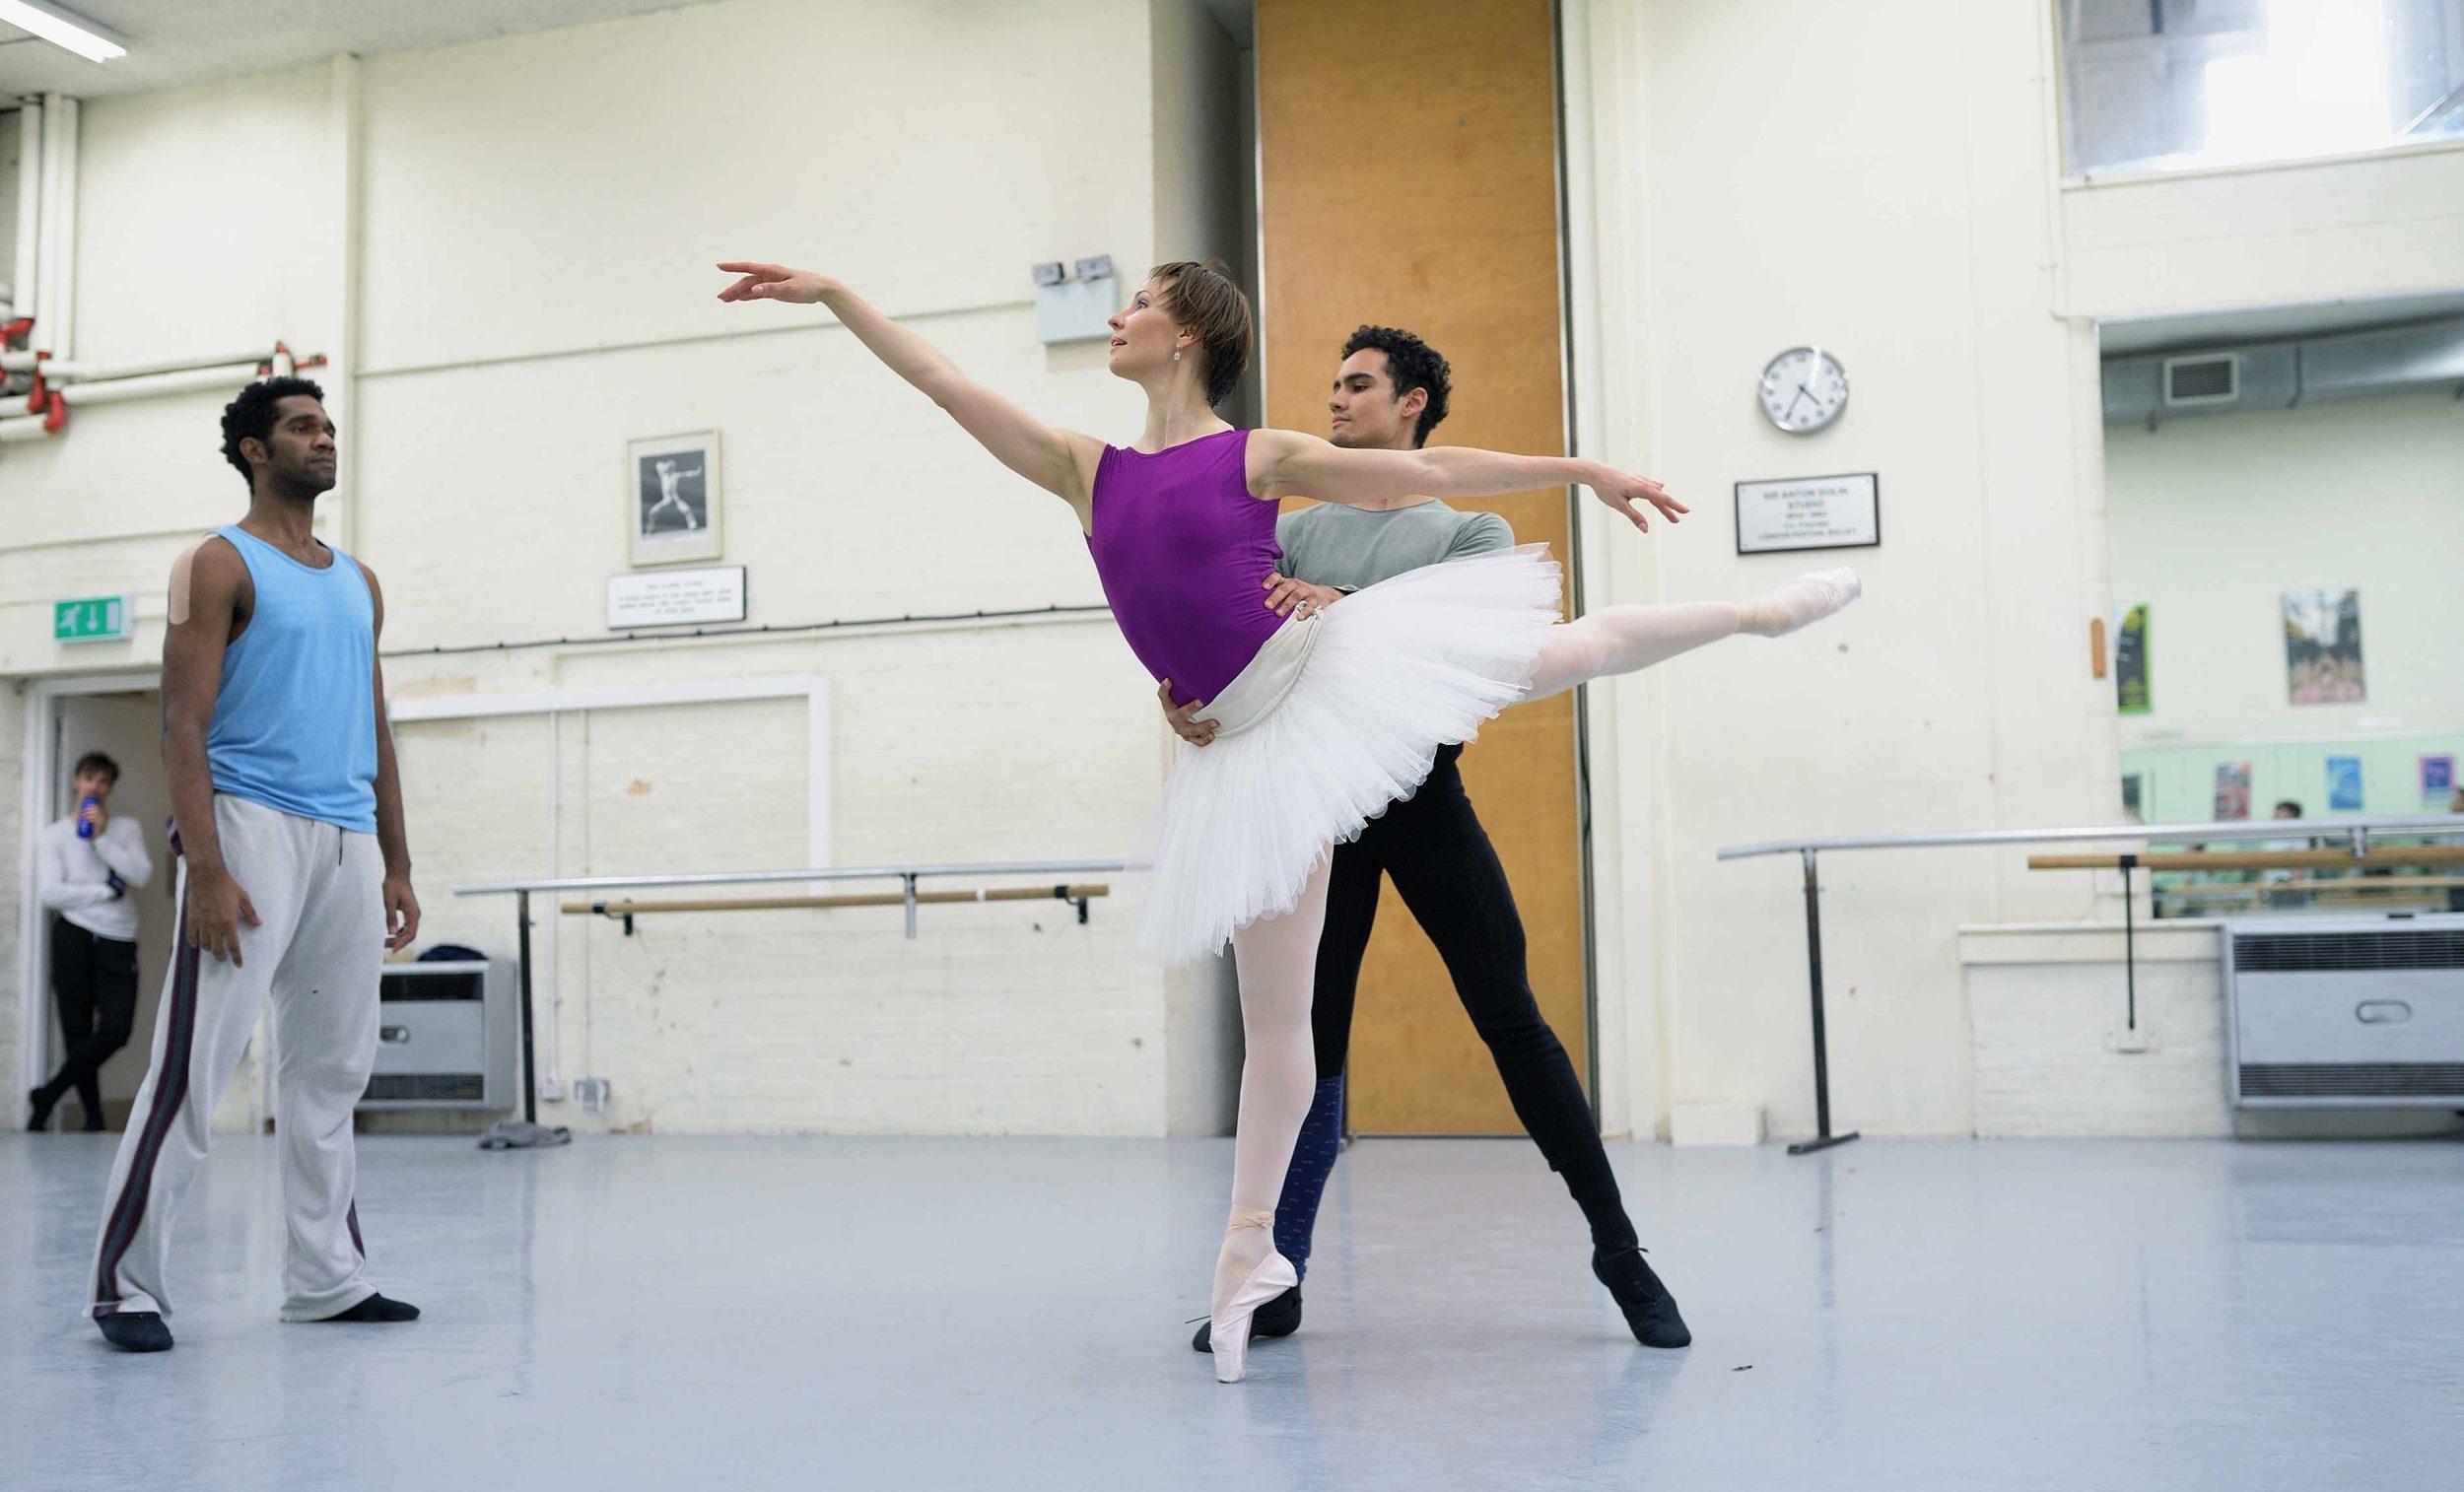 Maria-Alexandrova-and-Daniel-McCormick-rehearsing-The-Sleeping-Beauty-©-Laurent-Liotardo